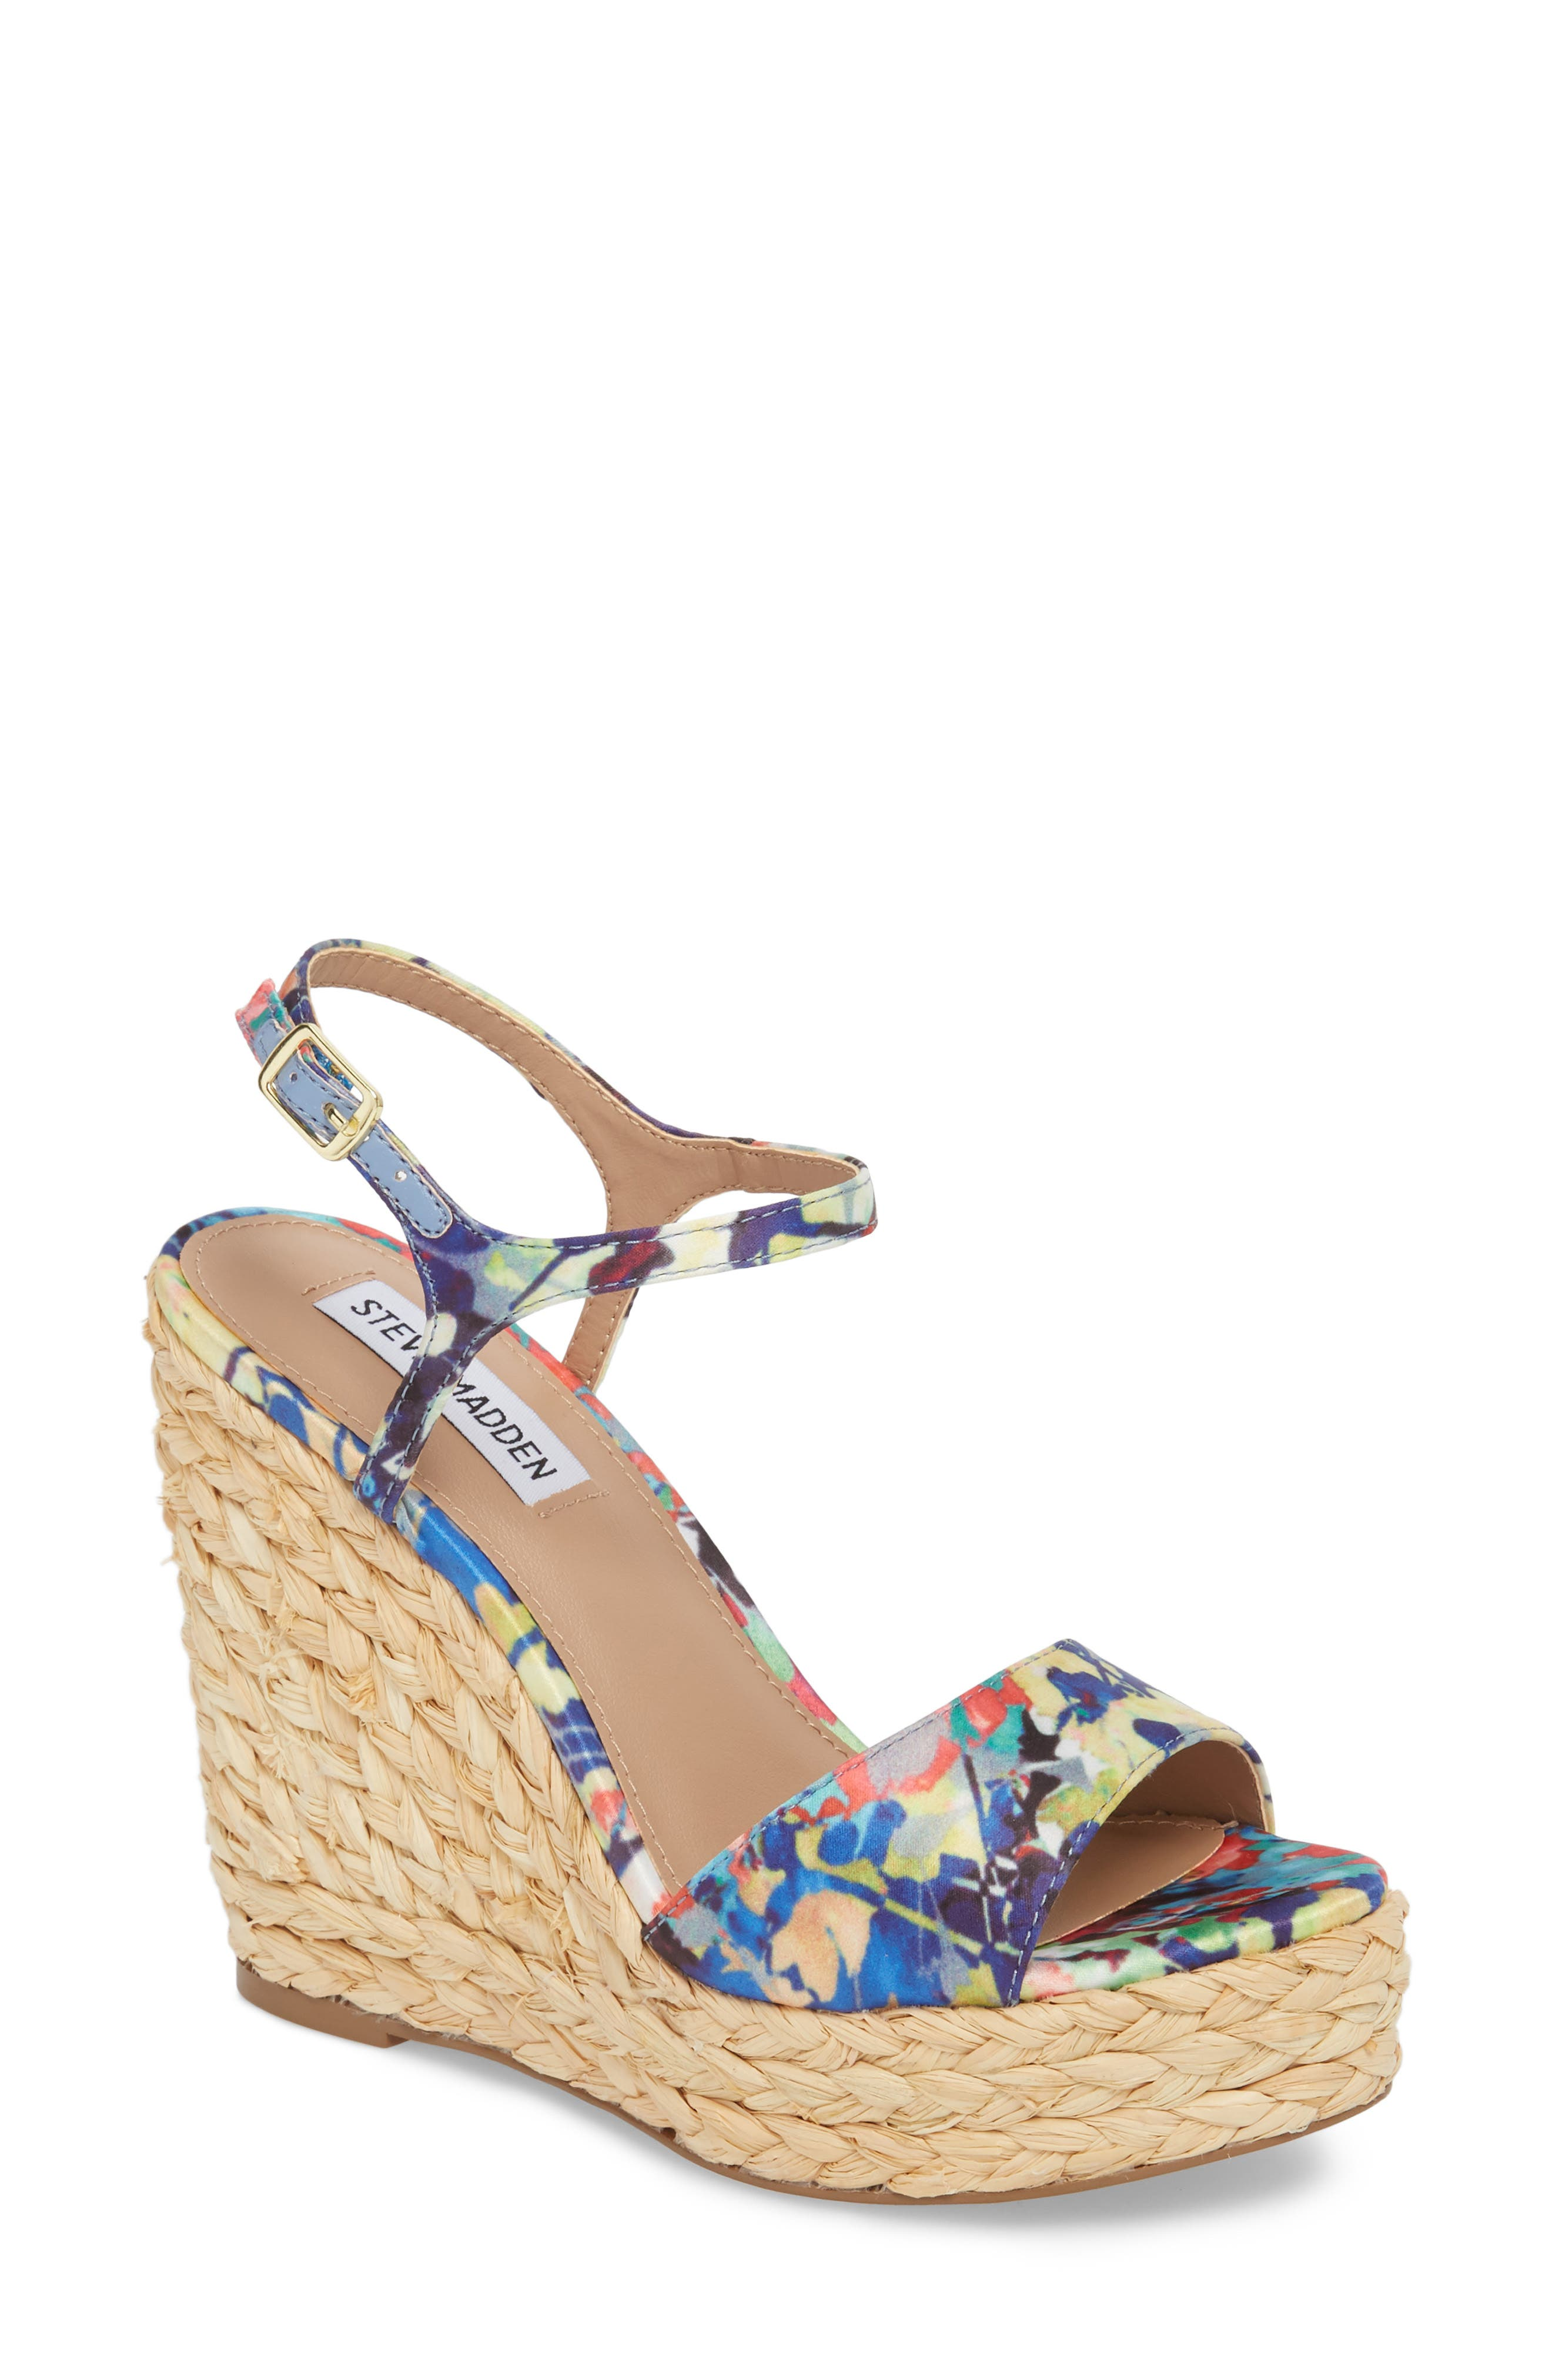 Tokin Espadrille Wedge Sandal,                             Main thumbnail 1, color,                             Floral Multi